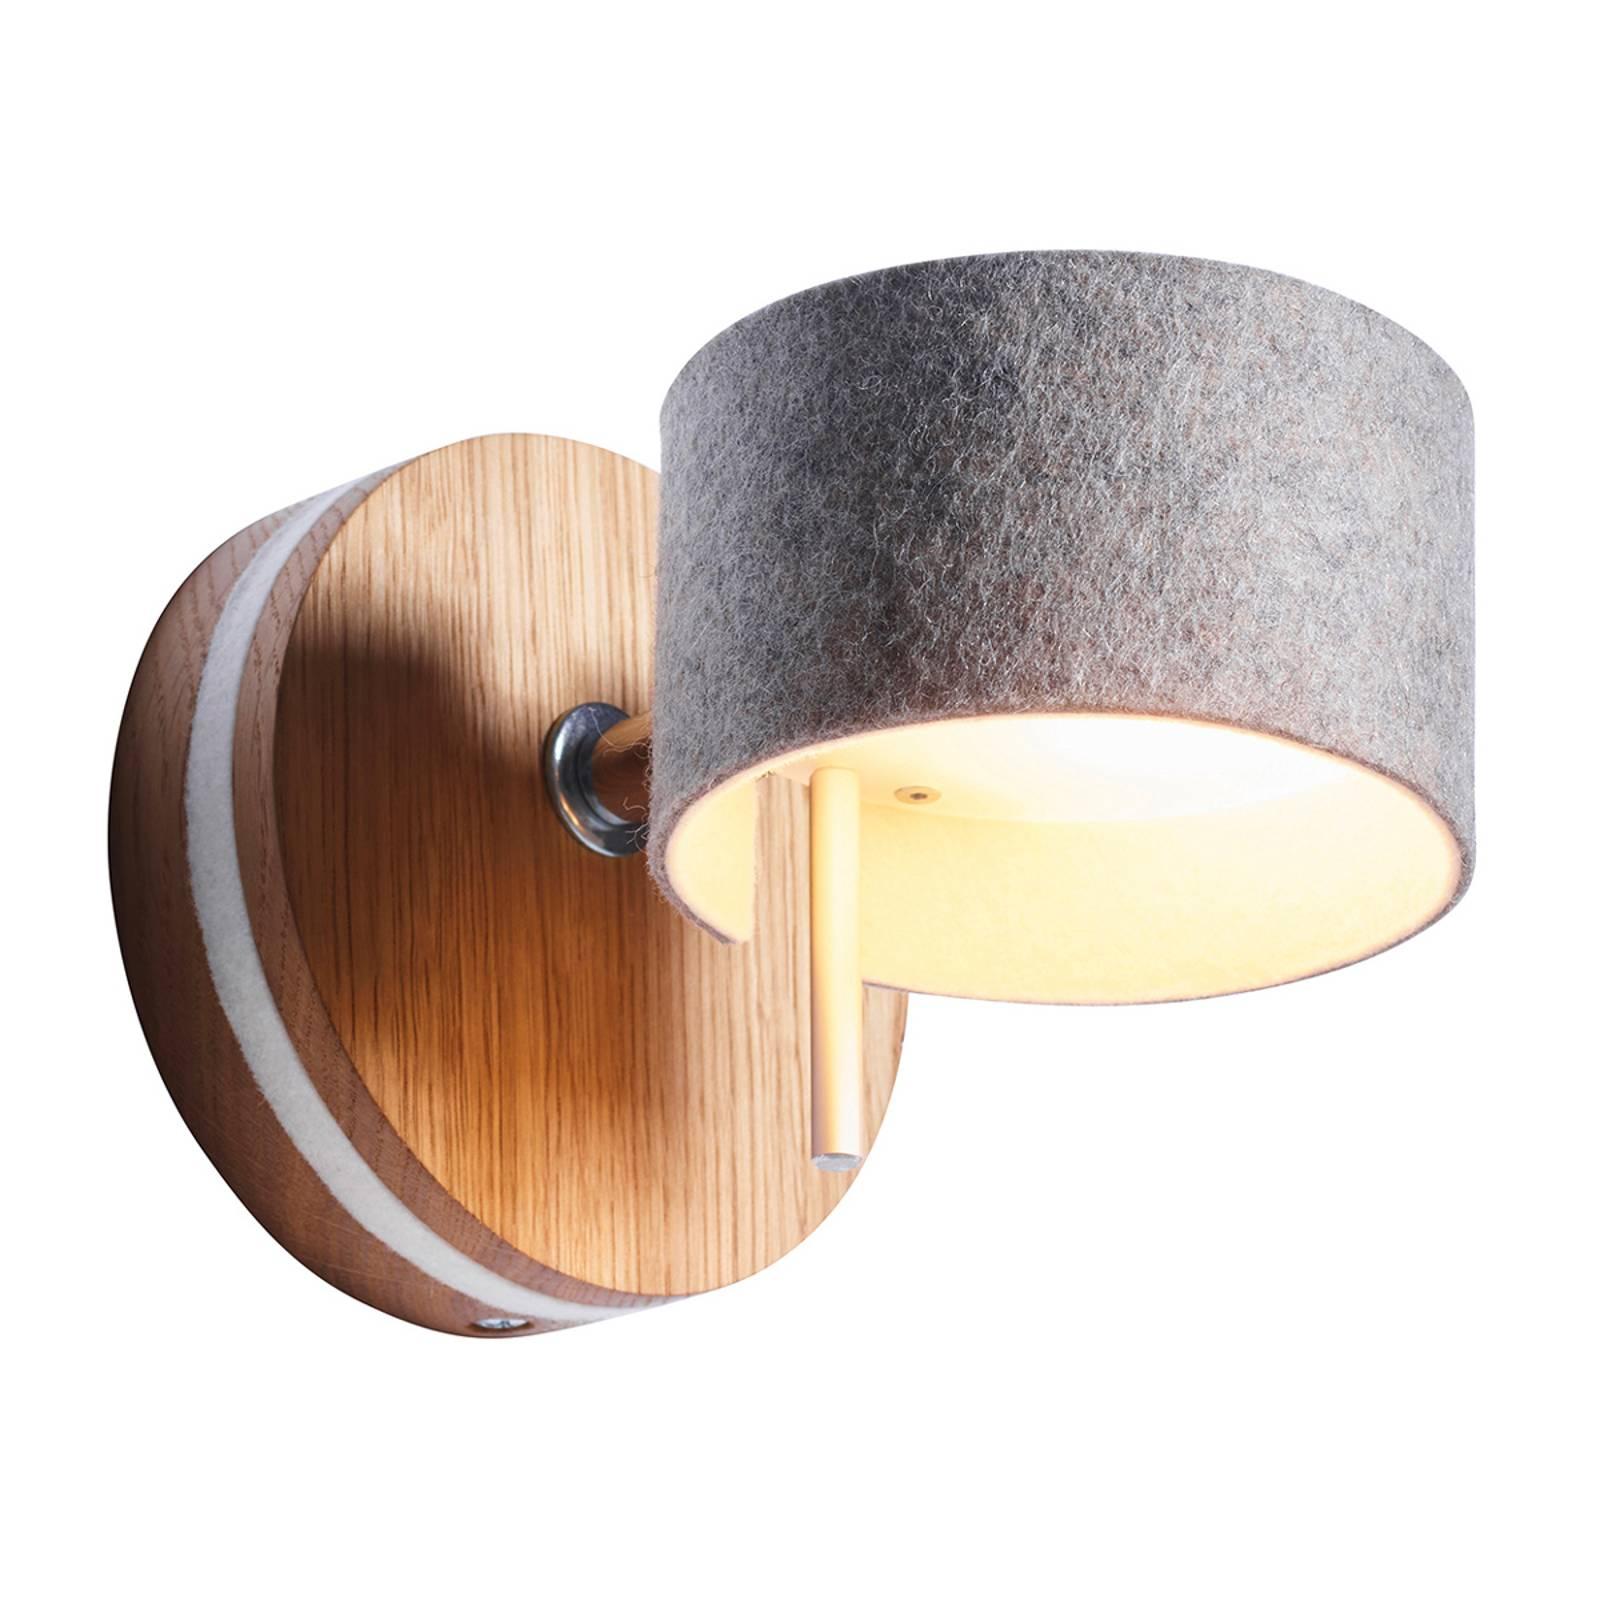 LED wandlamp Frits met eikenhout en vilt